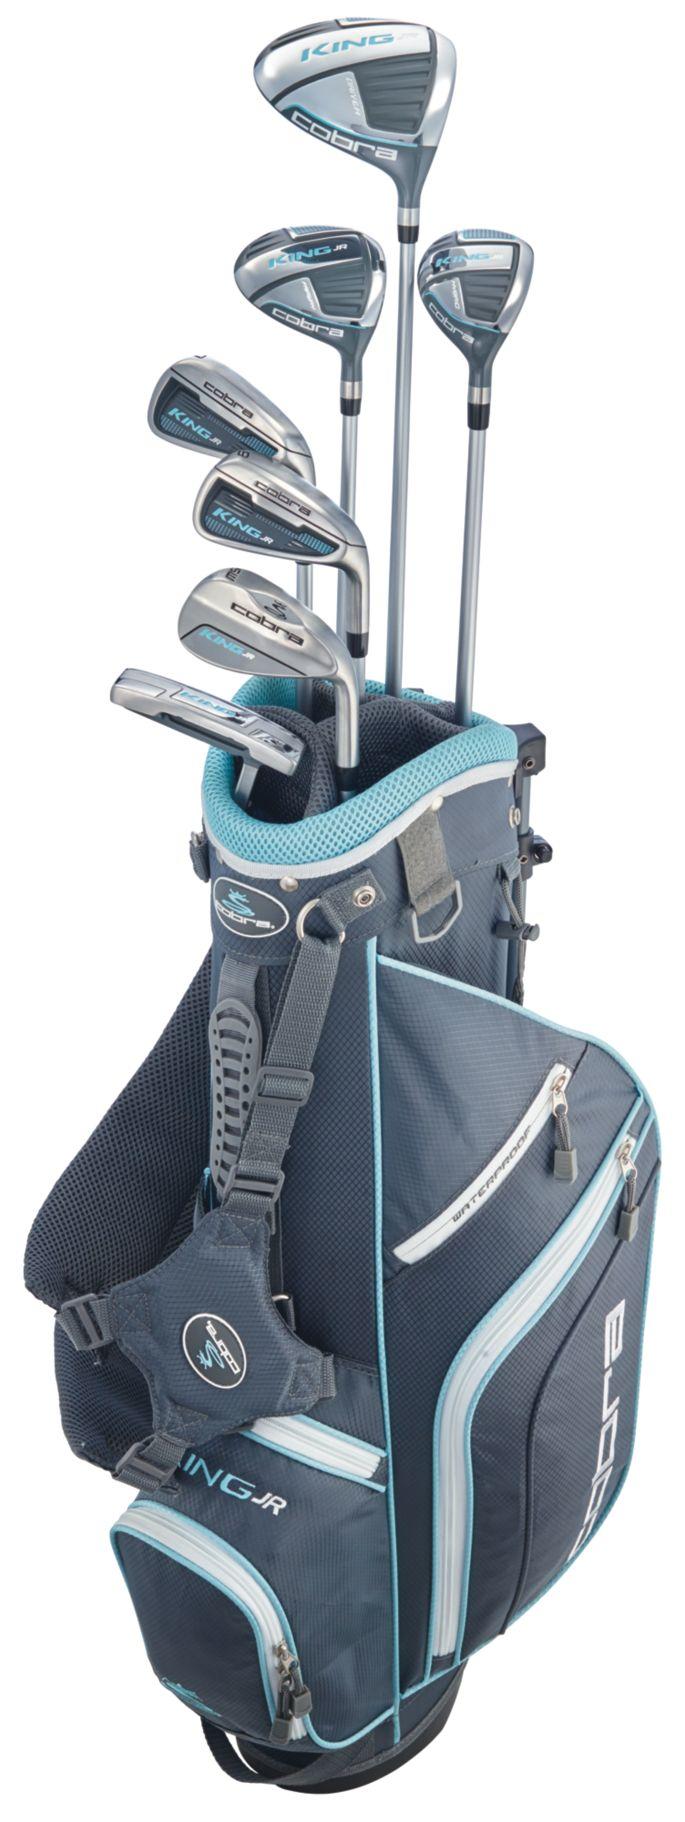 5b2c5154536b Cobra Girls' KING Junior Complete Set (Ages 9-12)   Golf Galaxy